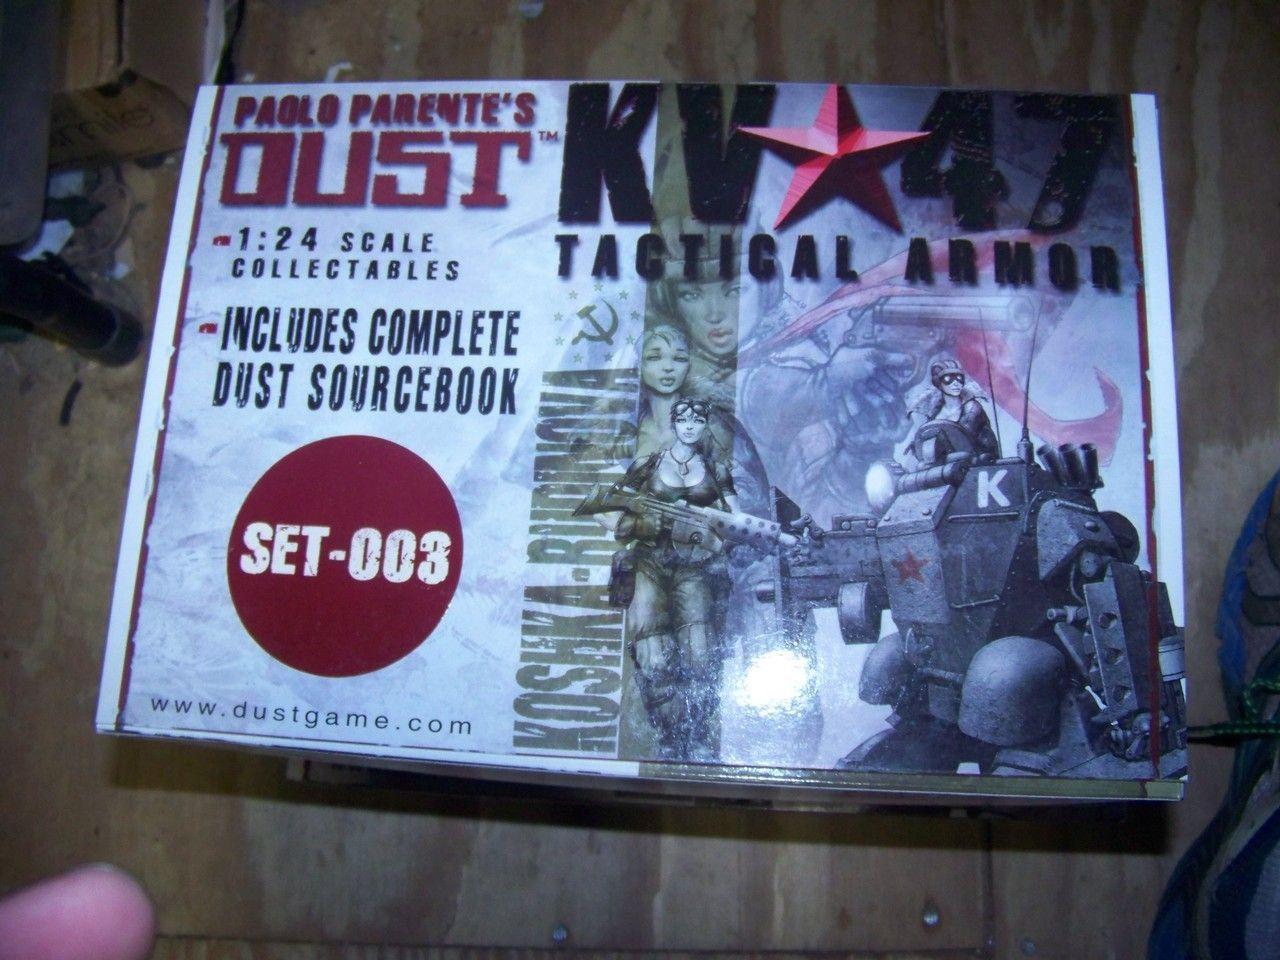 DUST Playset 003 KV47 Tactical Armor Paolo Parente 1:24 scale Four figures RARE No Book